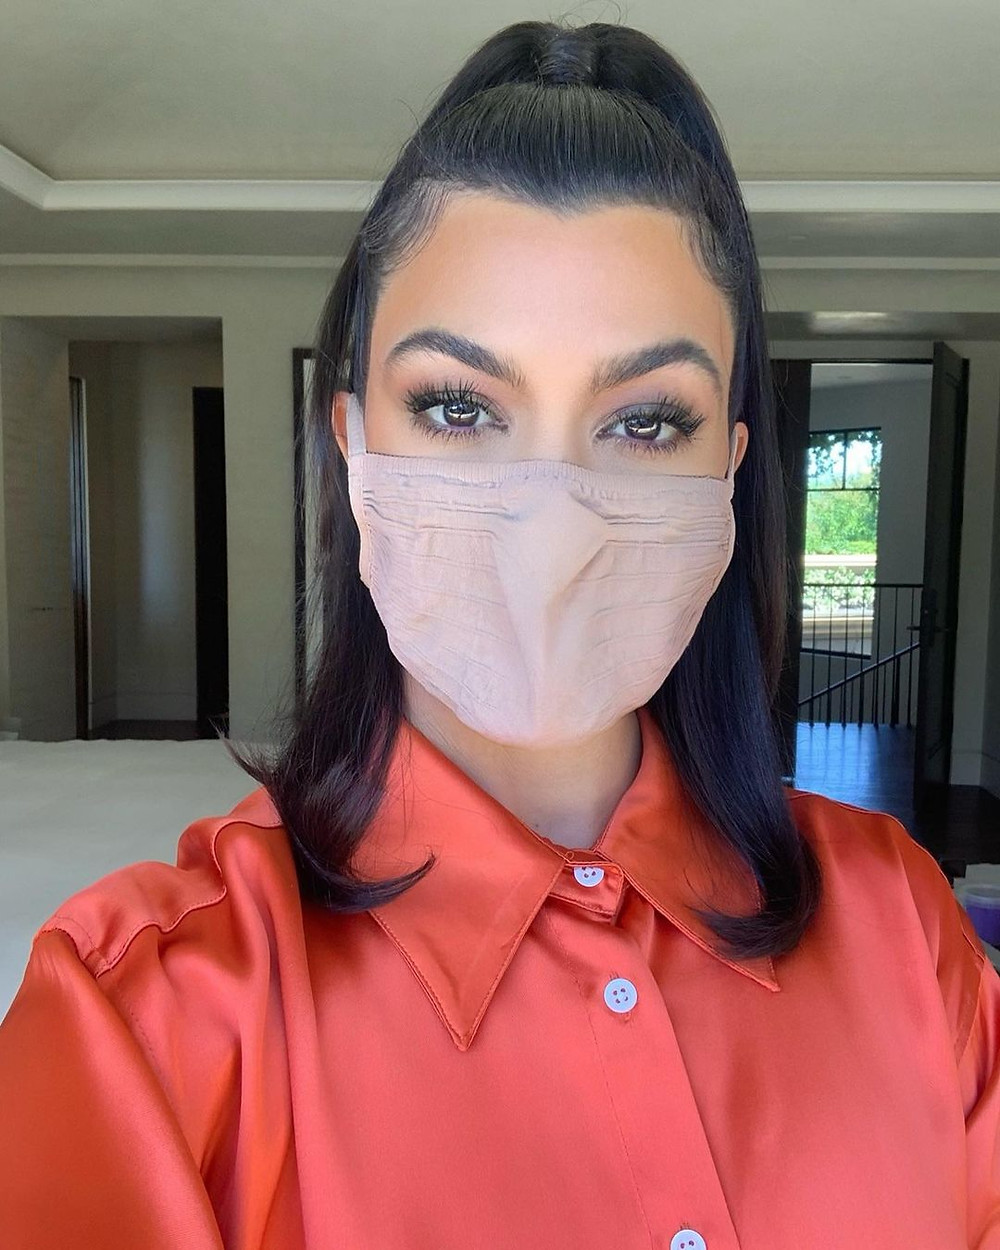 kourtney kardashian wearing mask